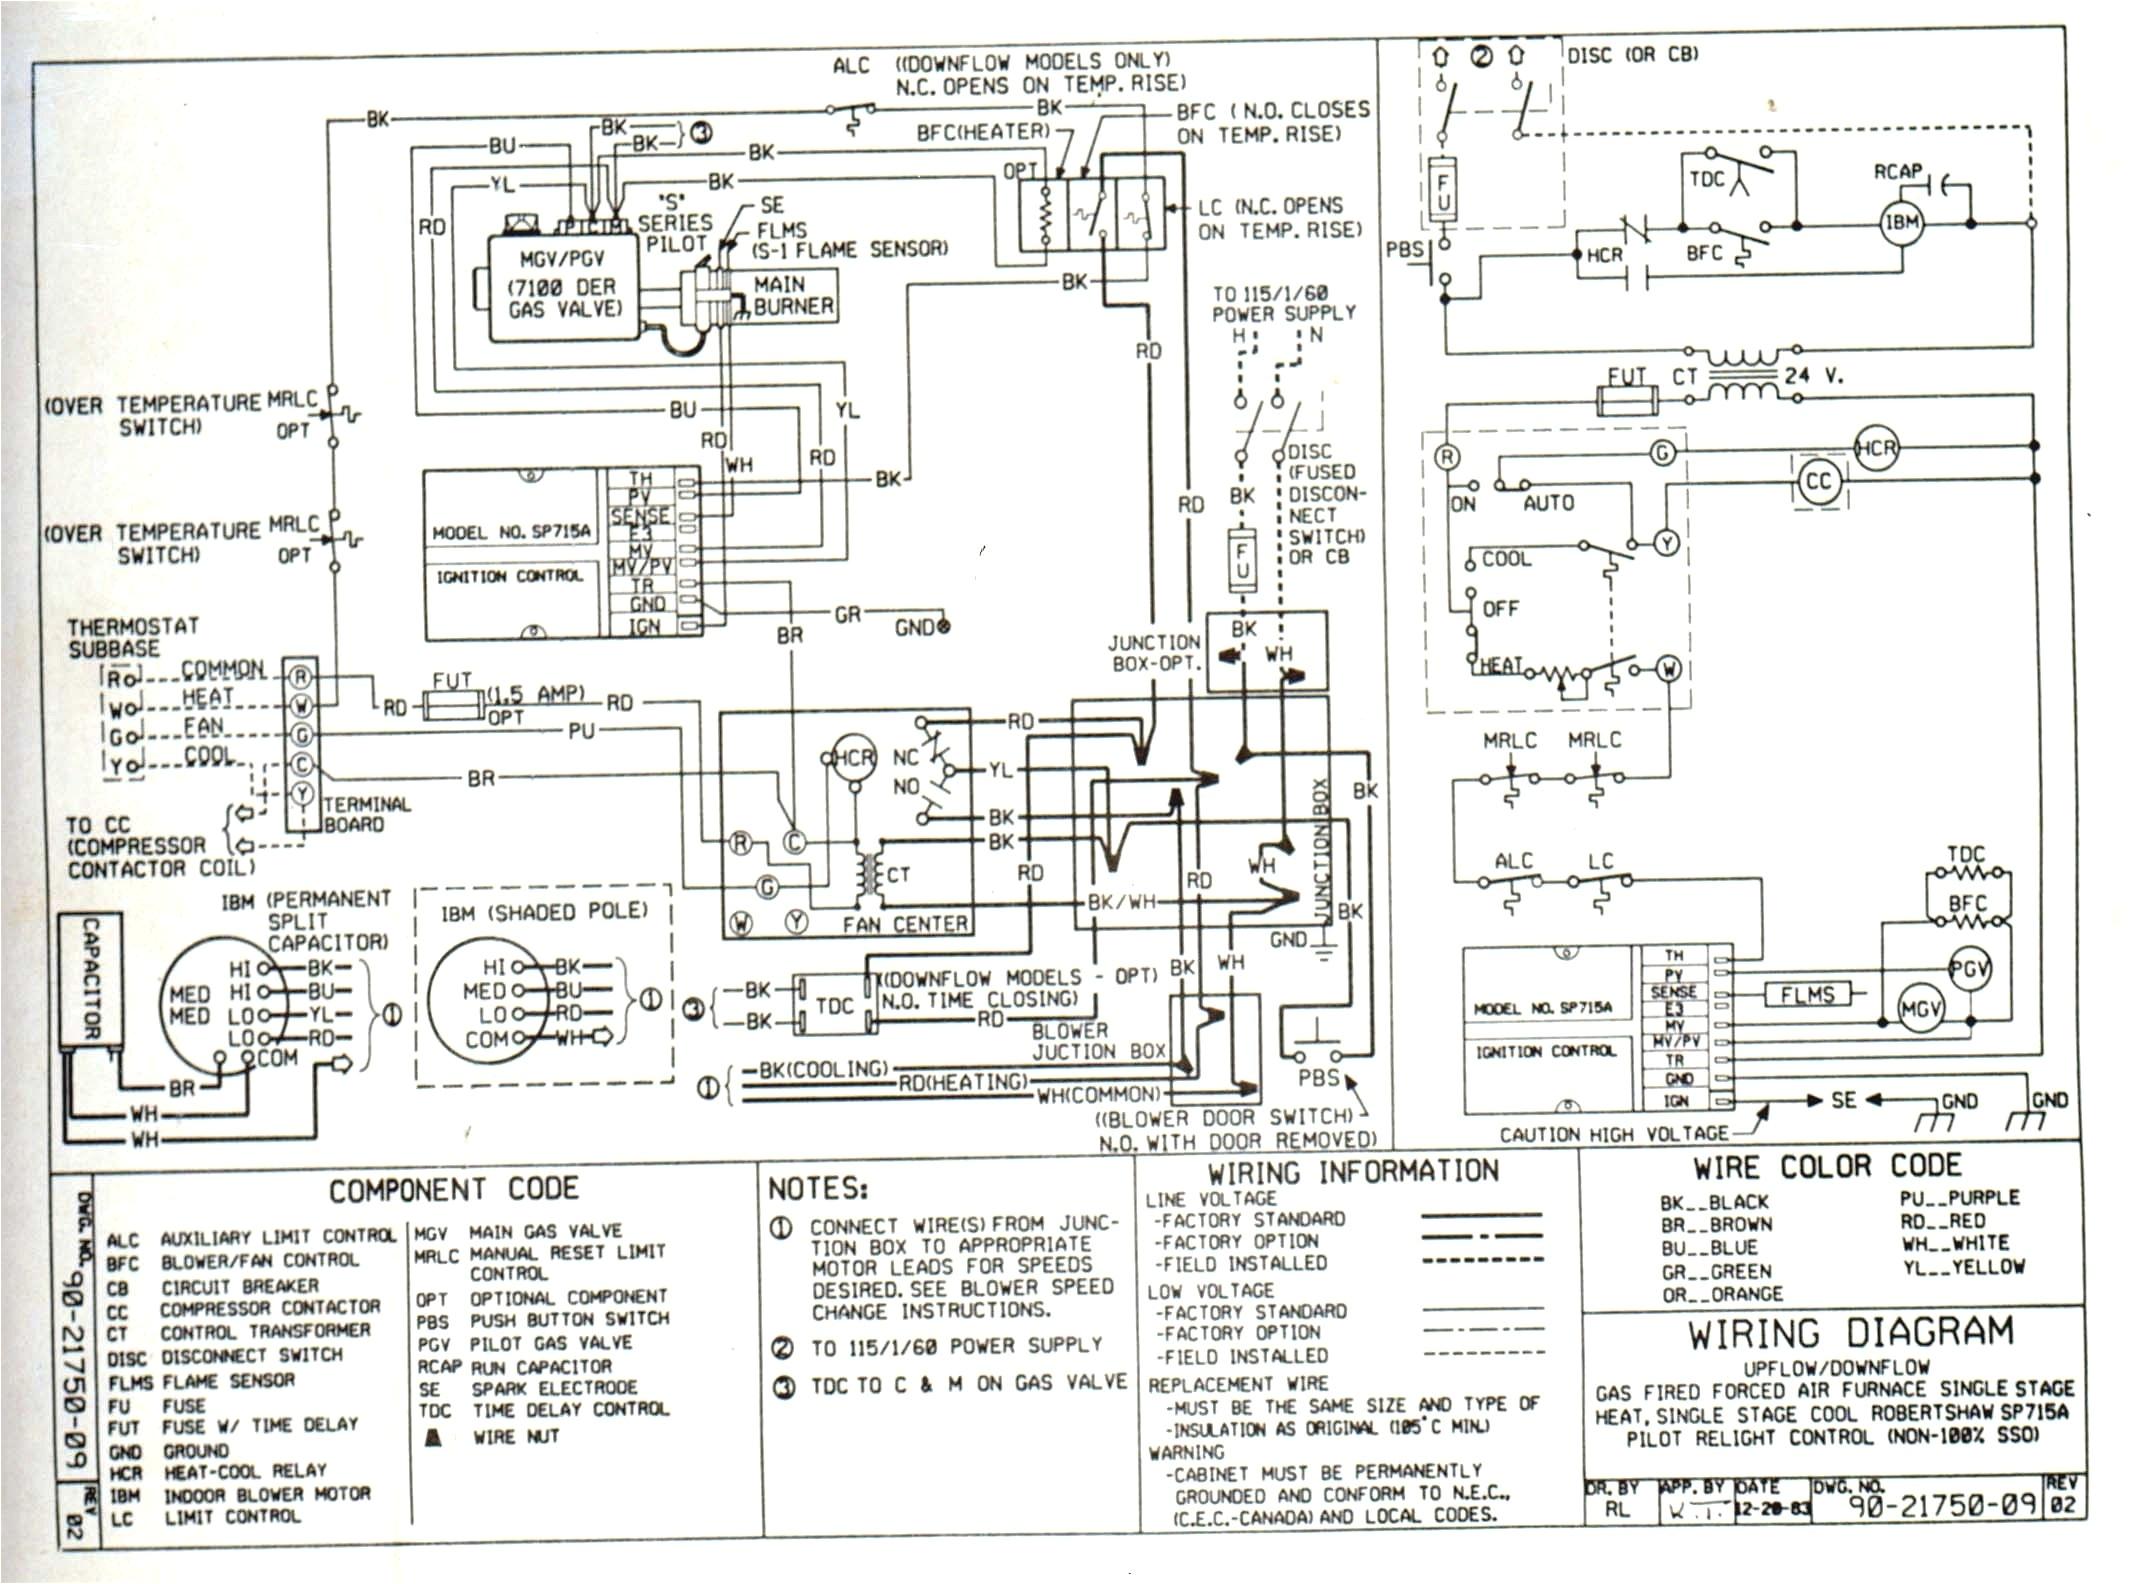 comfortmaker wiring diagram wiring diagram world comfortmaker thermostat wiring diagram